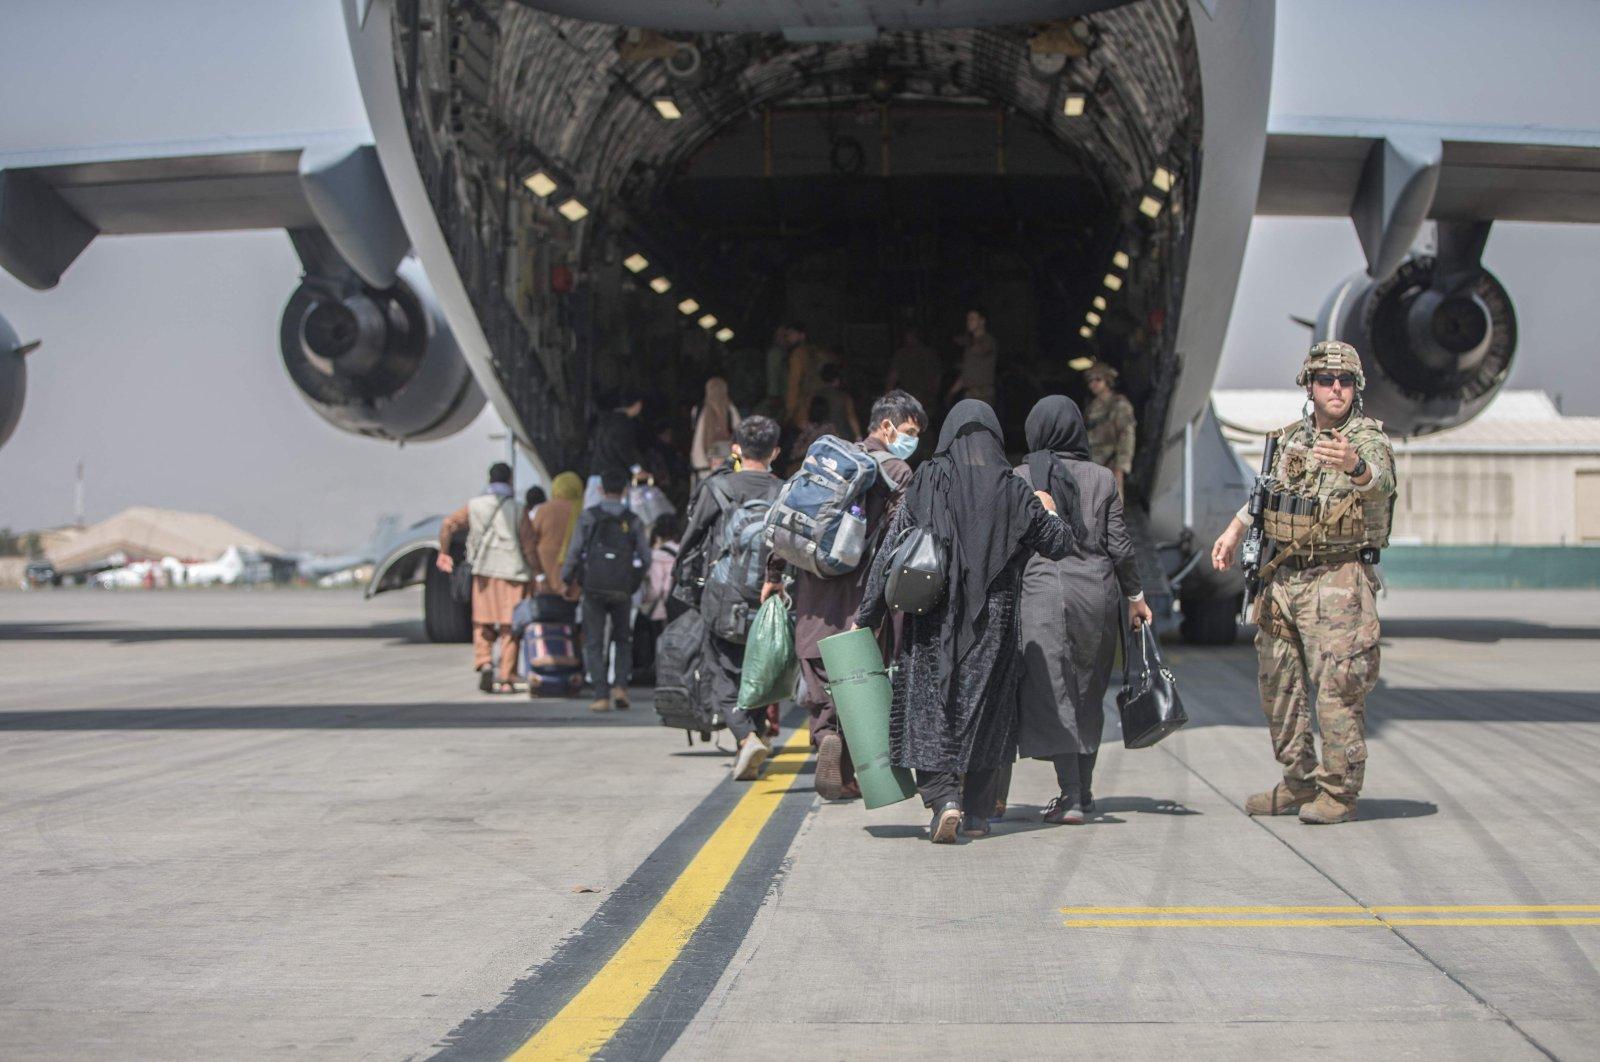 Families begin to board a U.S. Air Force Boeing C-17 Globemaster III during an evacuation at Kabul Hamid Karzai International Airport, Kabul, Afghanistan, Aug. 23, 2021. (U.S. Marine Corps via AFP Photo)